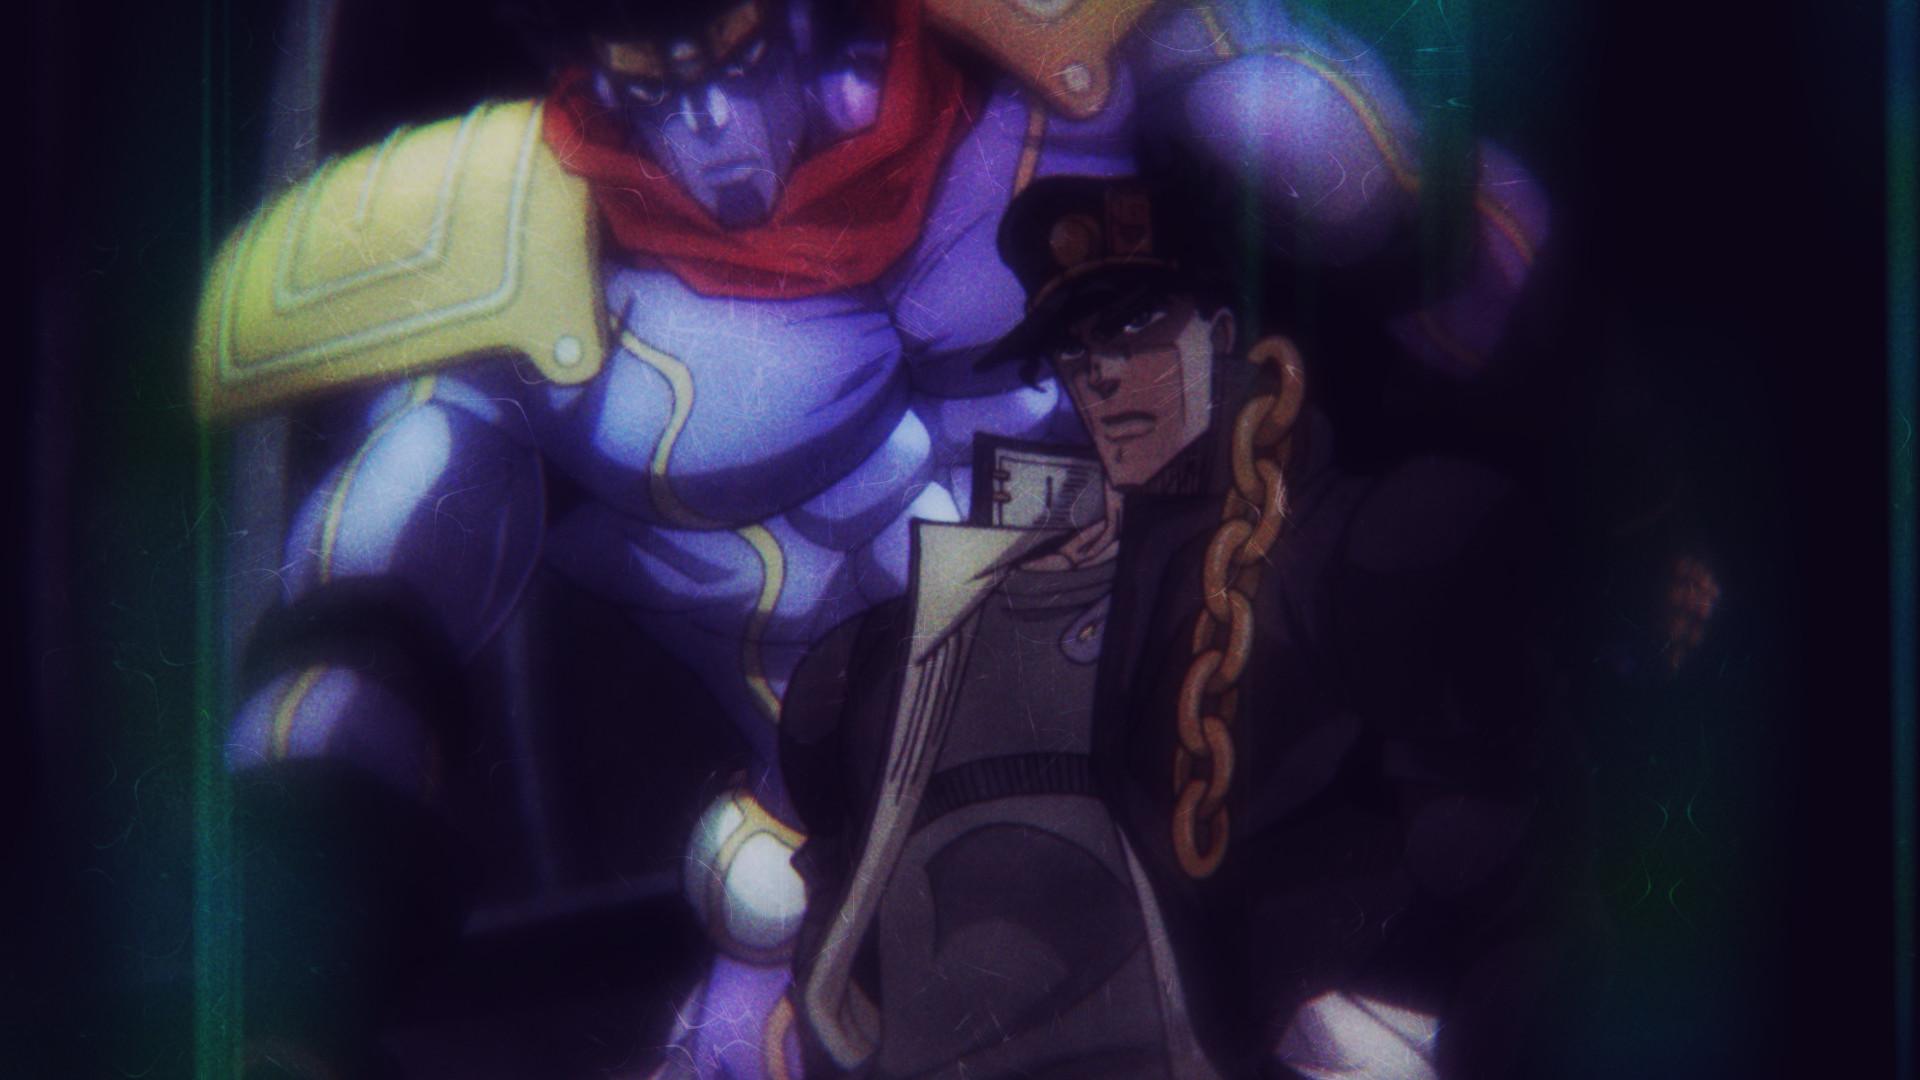 Anime – Jojo's Bizarre Adventure Jotaro Kujo Star Platinum (Jojo's Bizarre  Adventure) Wallpaper